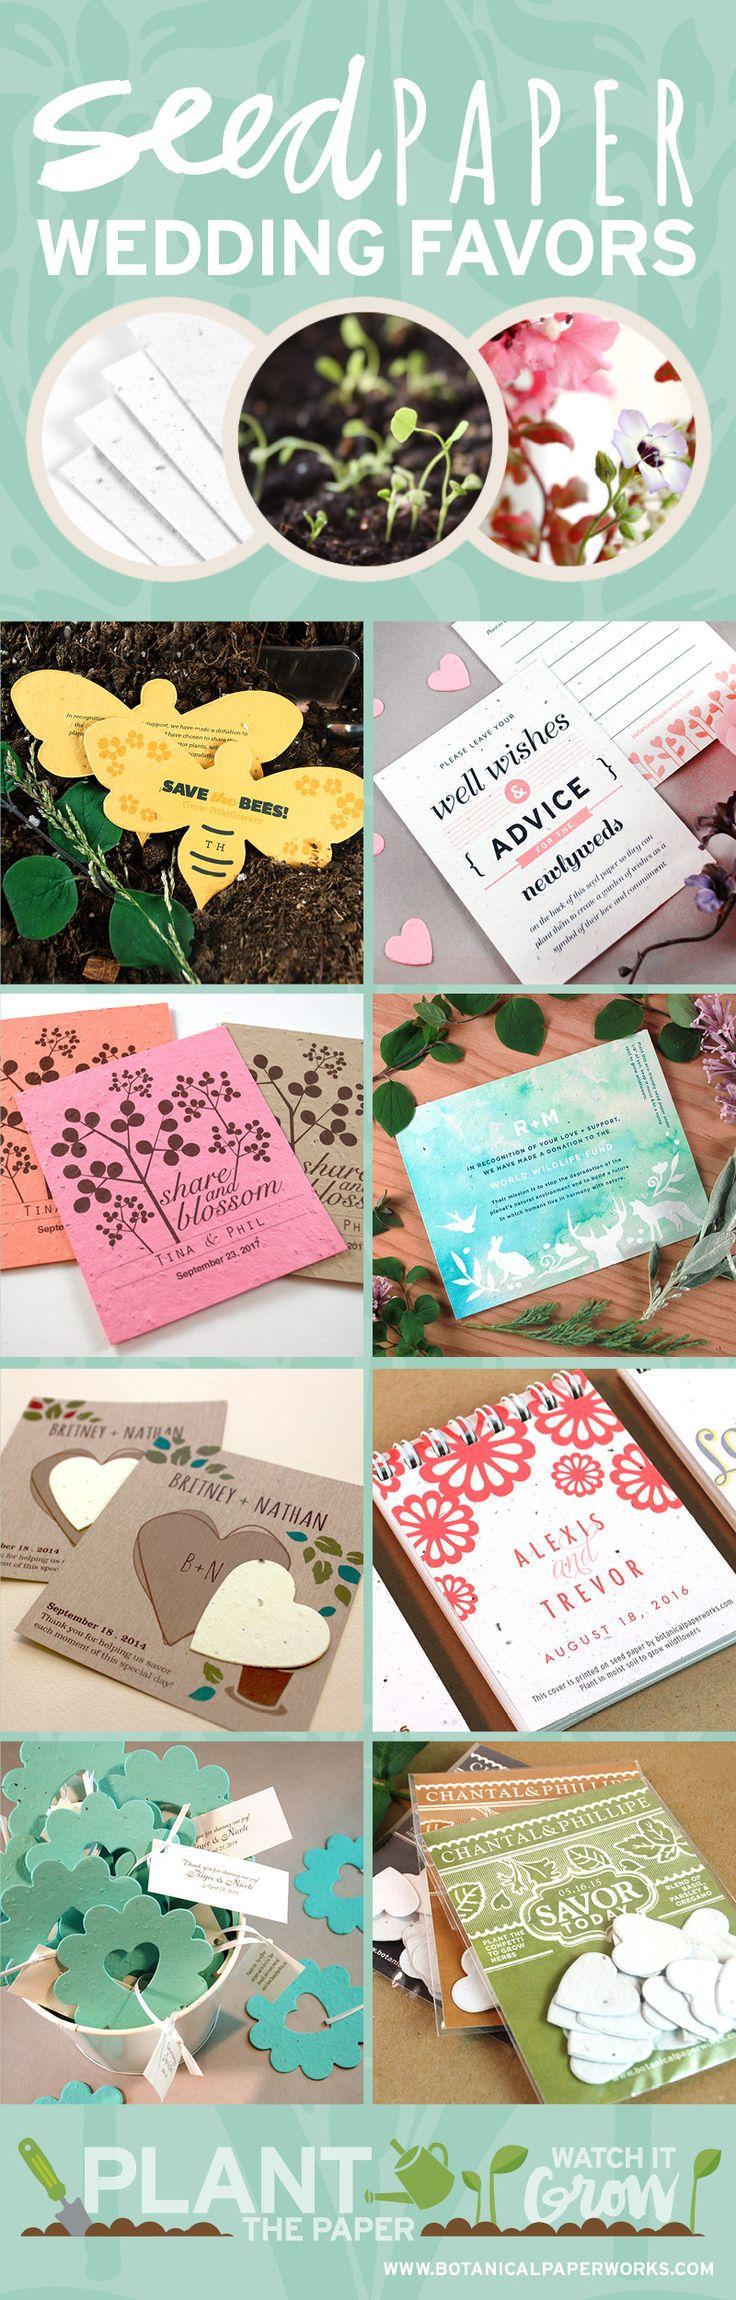 grape wedding invitations plantable wedding invitations See dozen of stylish ecofriendly plantable wedding favor ideas from Botanical PaperWorks Made